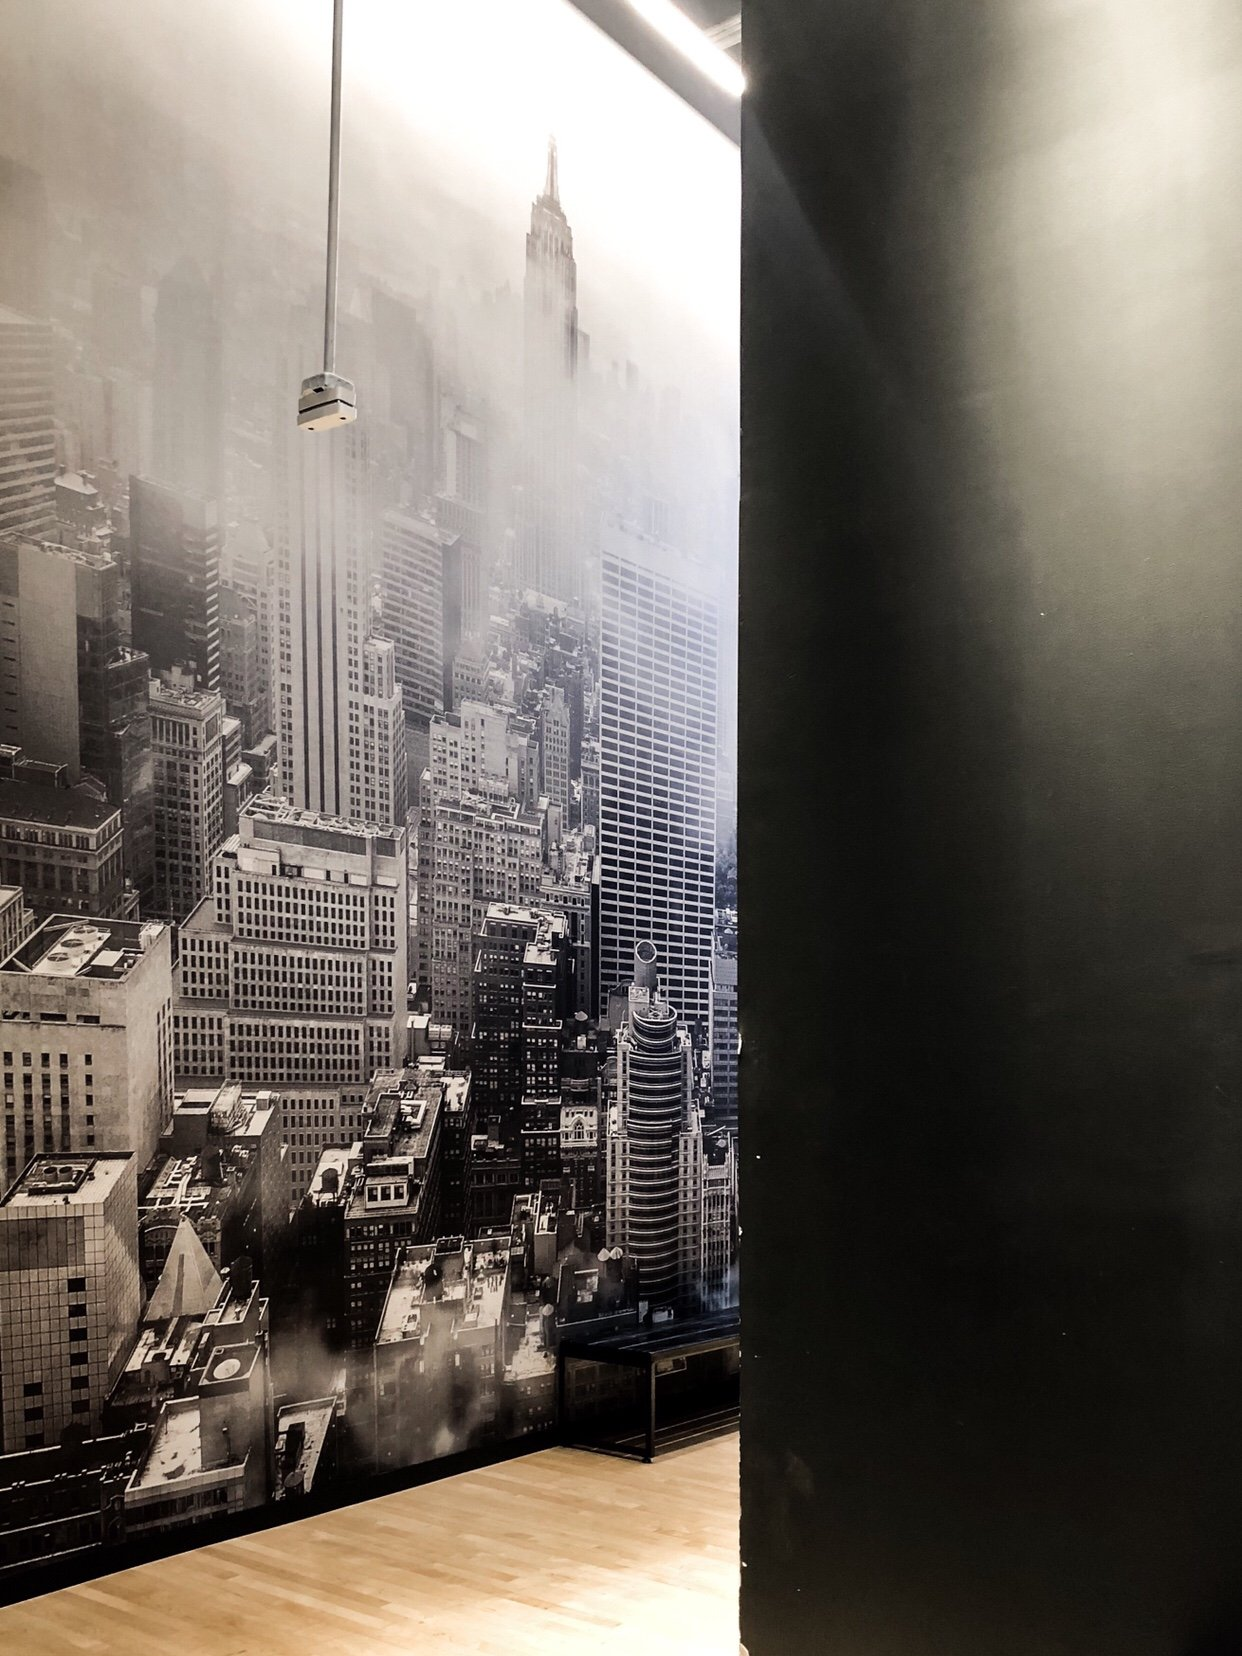 4 Tage in New York City -Nike SoHo - Nowshine Reiseblog ü 40